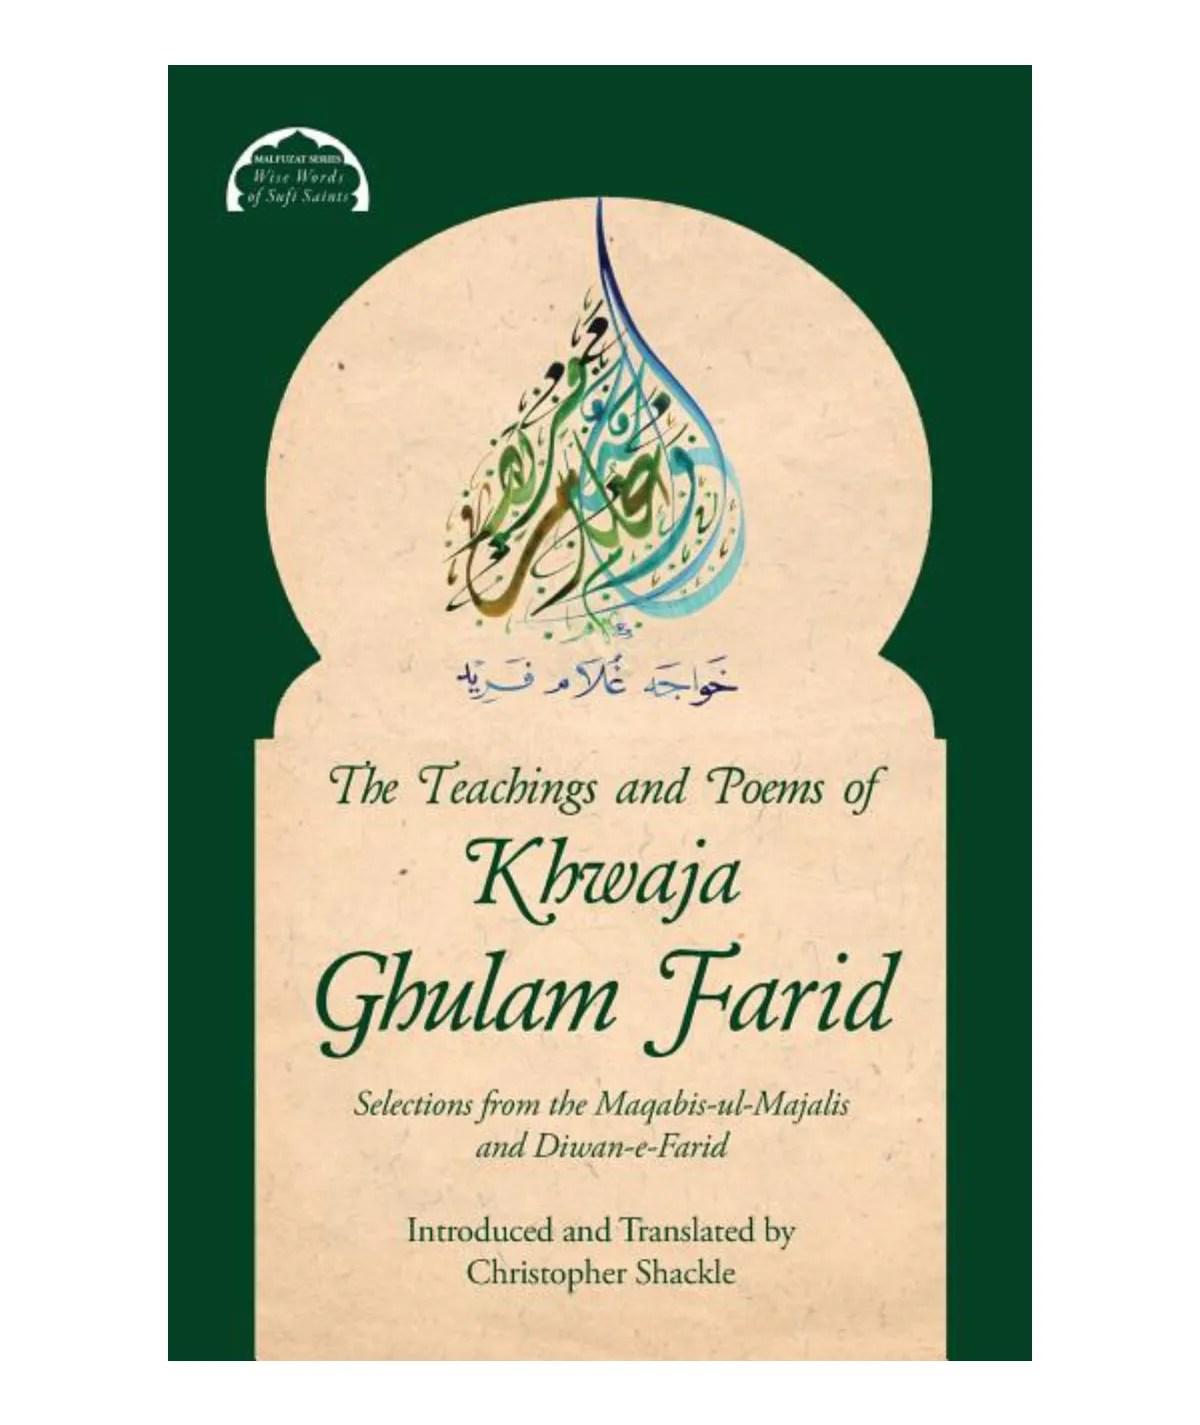 The Teachings and Poems of Khwaja Ghulam Farid: Selections from the Maqabis-ul-Majalis and Diwan-e-Farid  ( Malfuzat: Wise Words of Sufi Saints  #3  ): Farid, Khwaja Ghulam | Shackle, Christopher